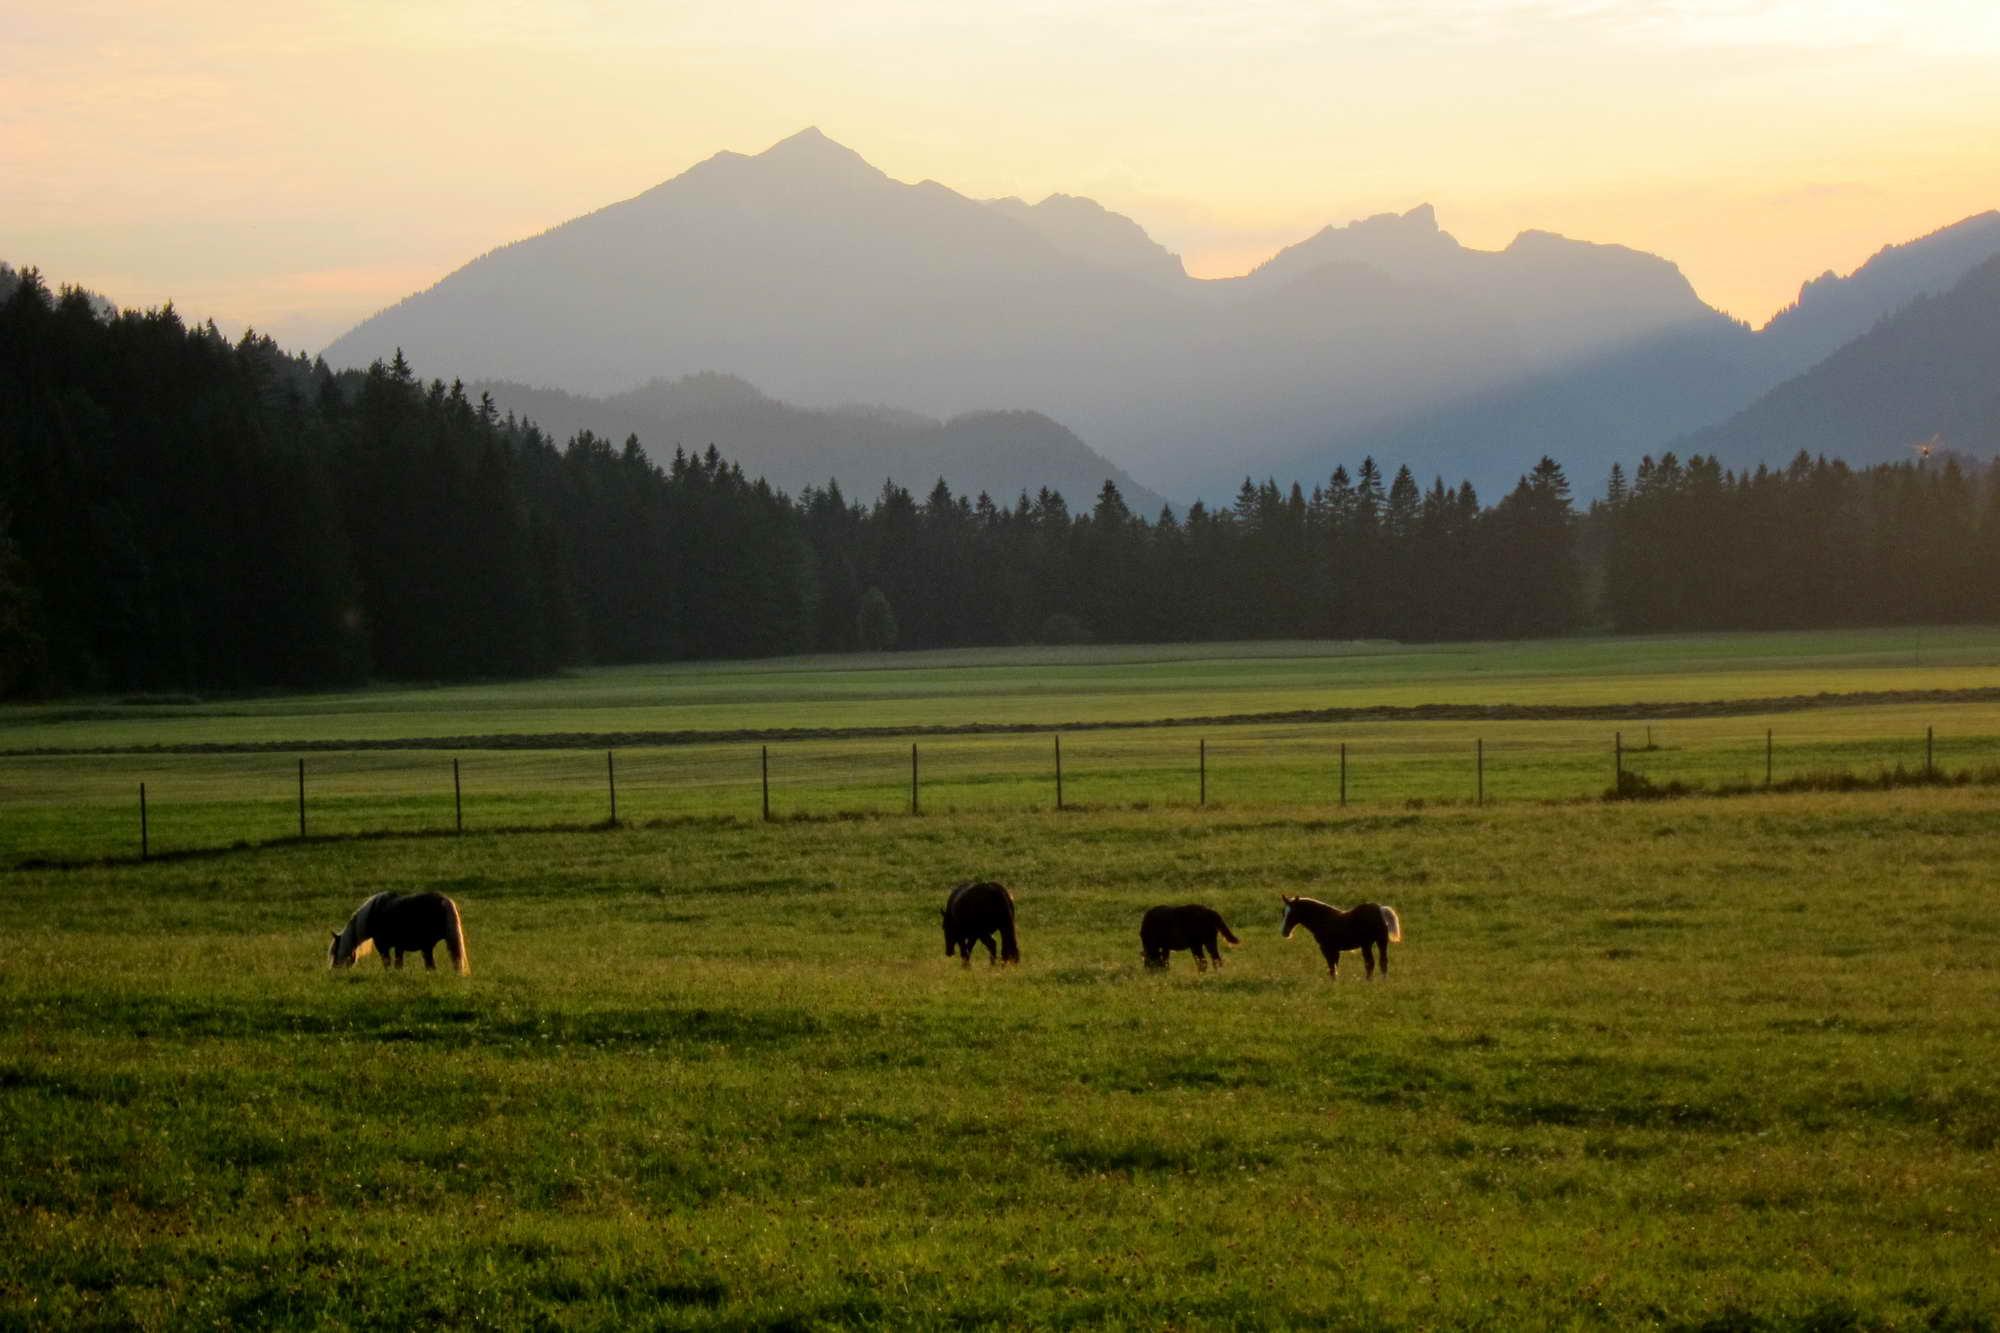 MT 2.3 Garmisch > Graswang (Oberbayern)